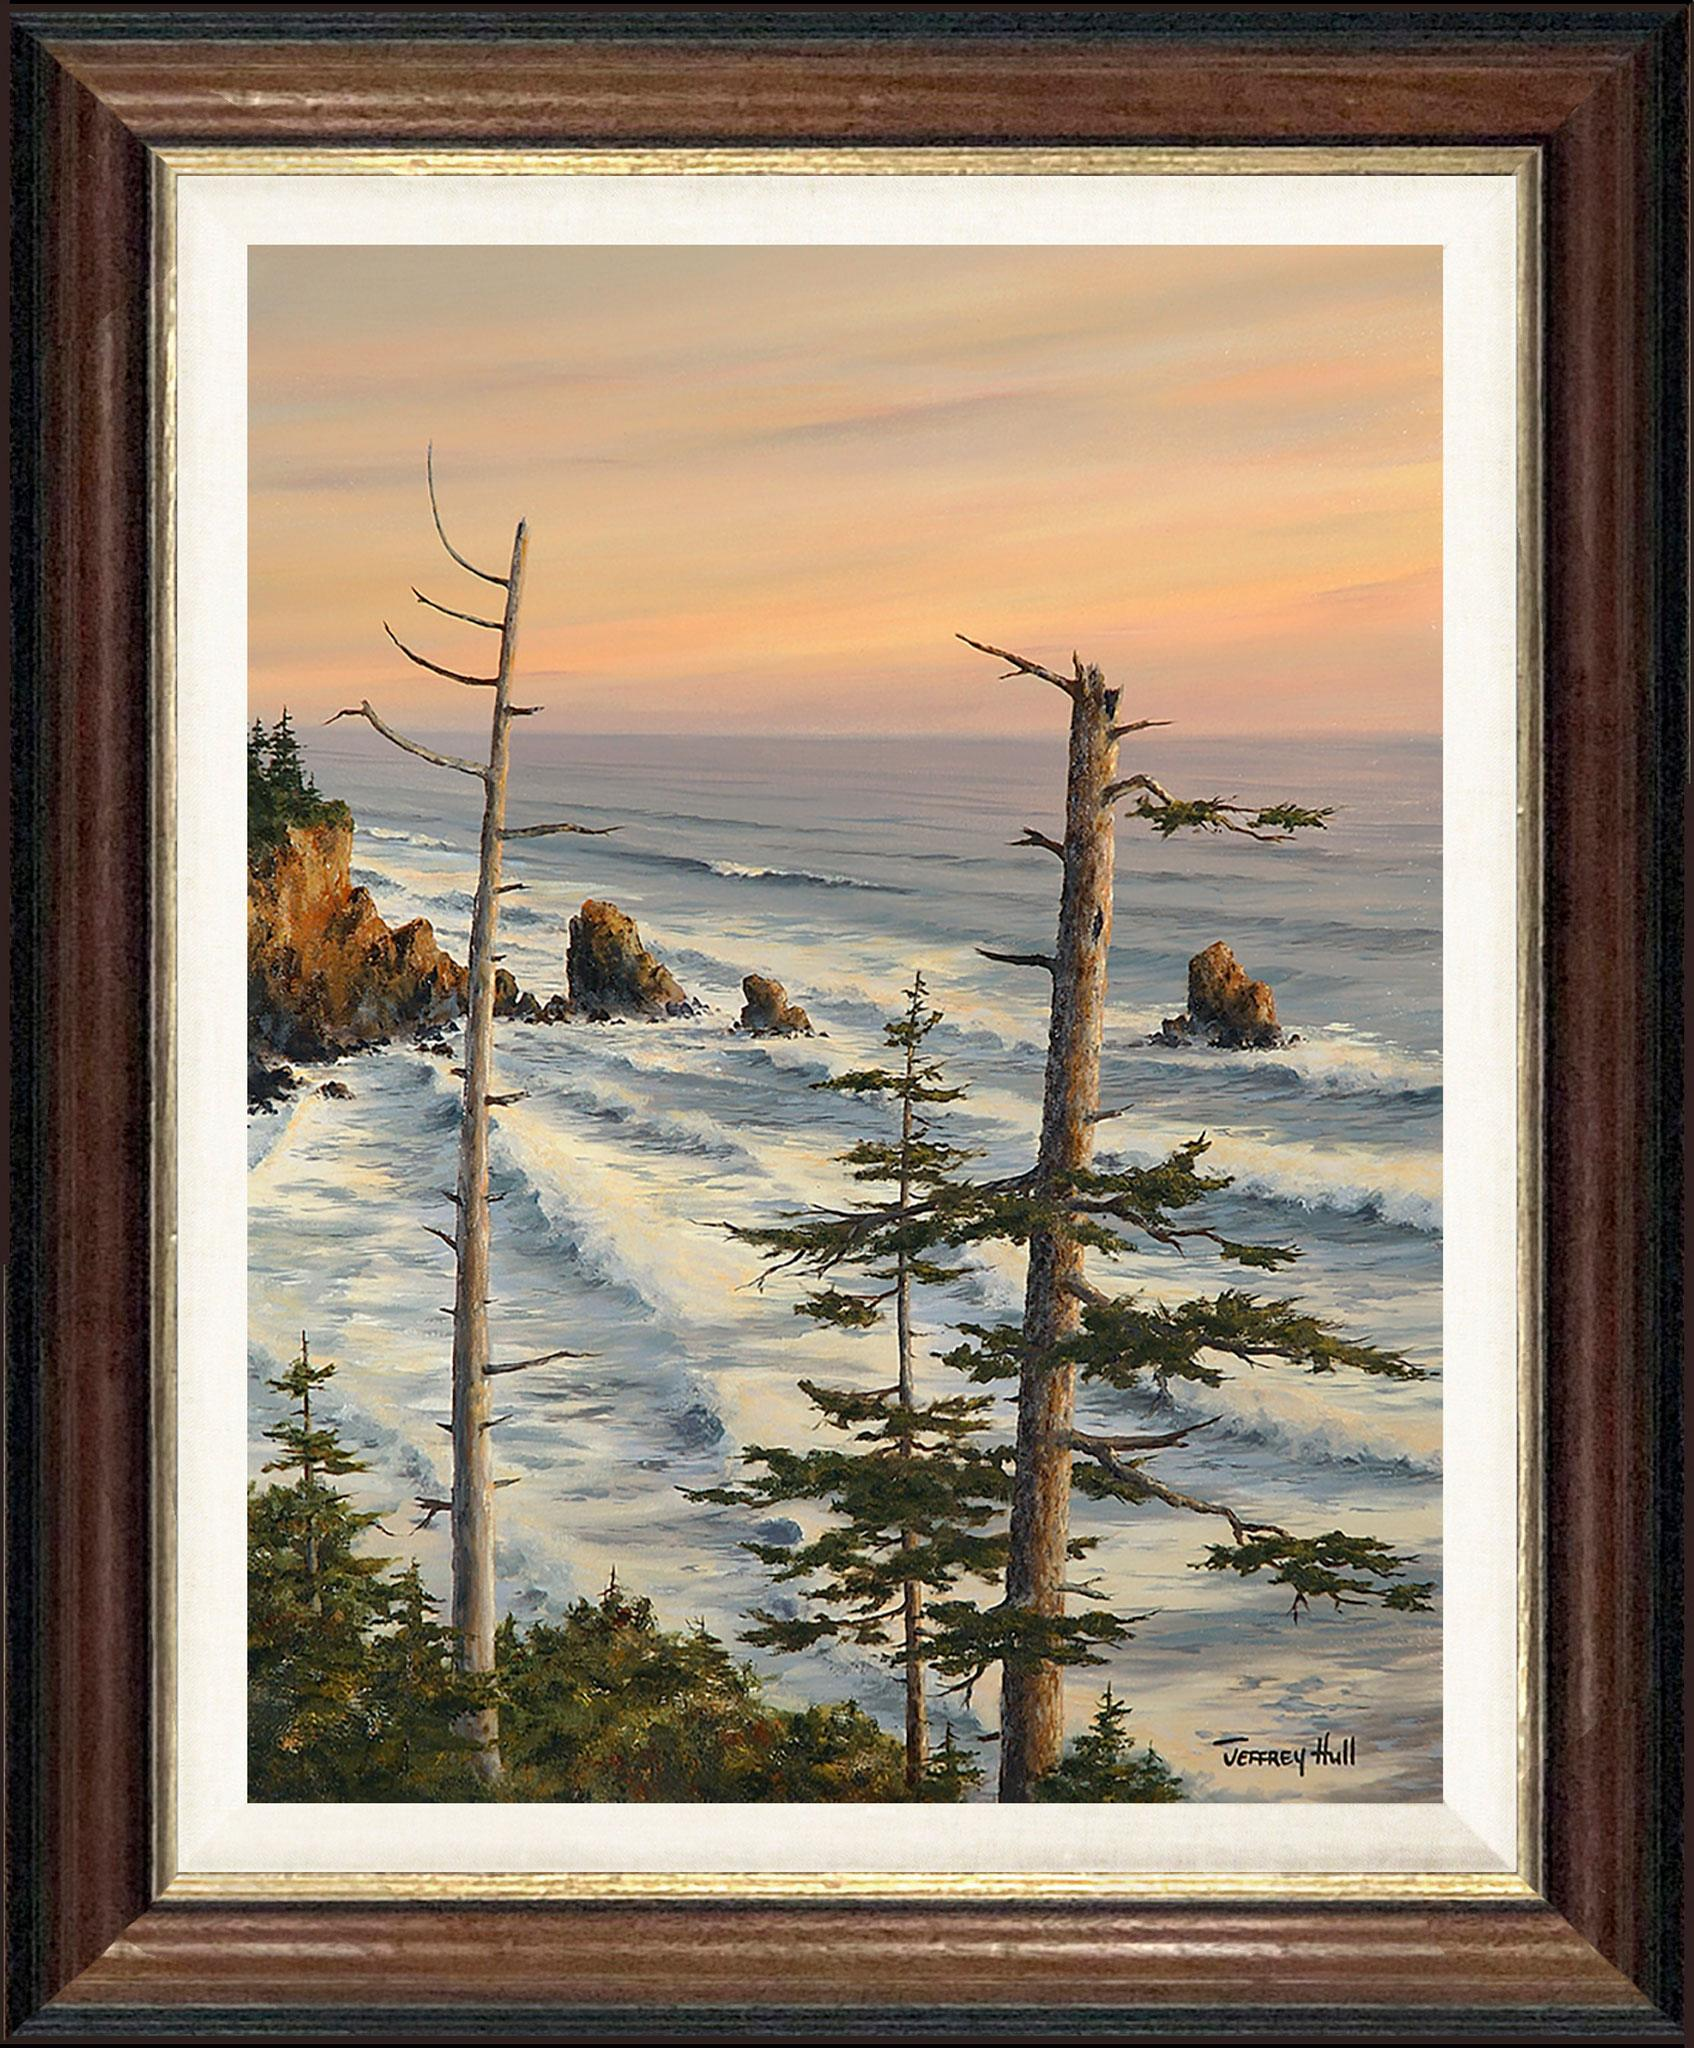 Sunset-Cliffs-OpenEd-Malabar-White-Liner-4-Website-2021